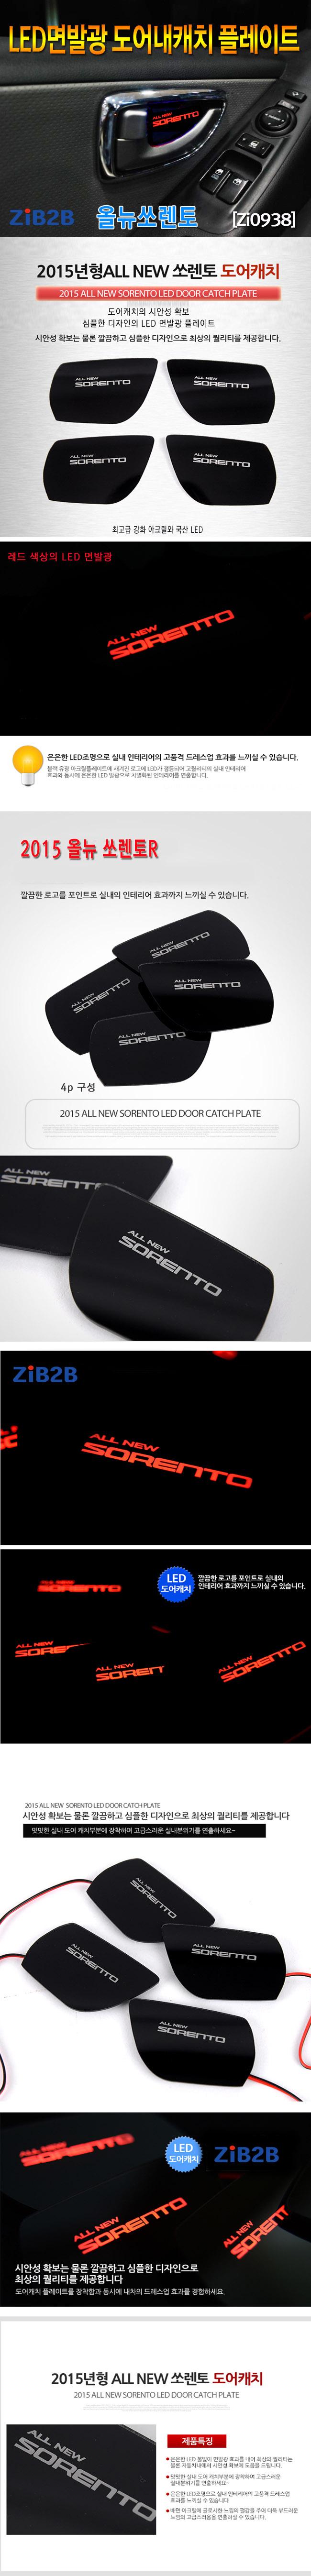 [ZiB2B] 2015년형 올뉴쏘렌토 전용 LED 도어내캐치 플레이트 [Zi0938]